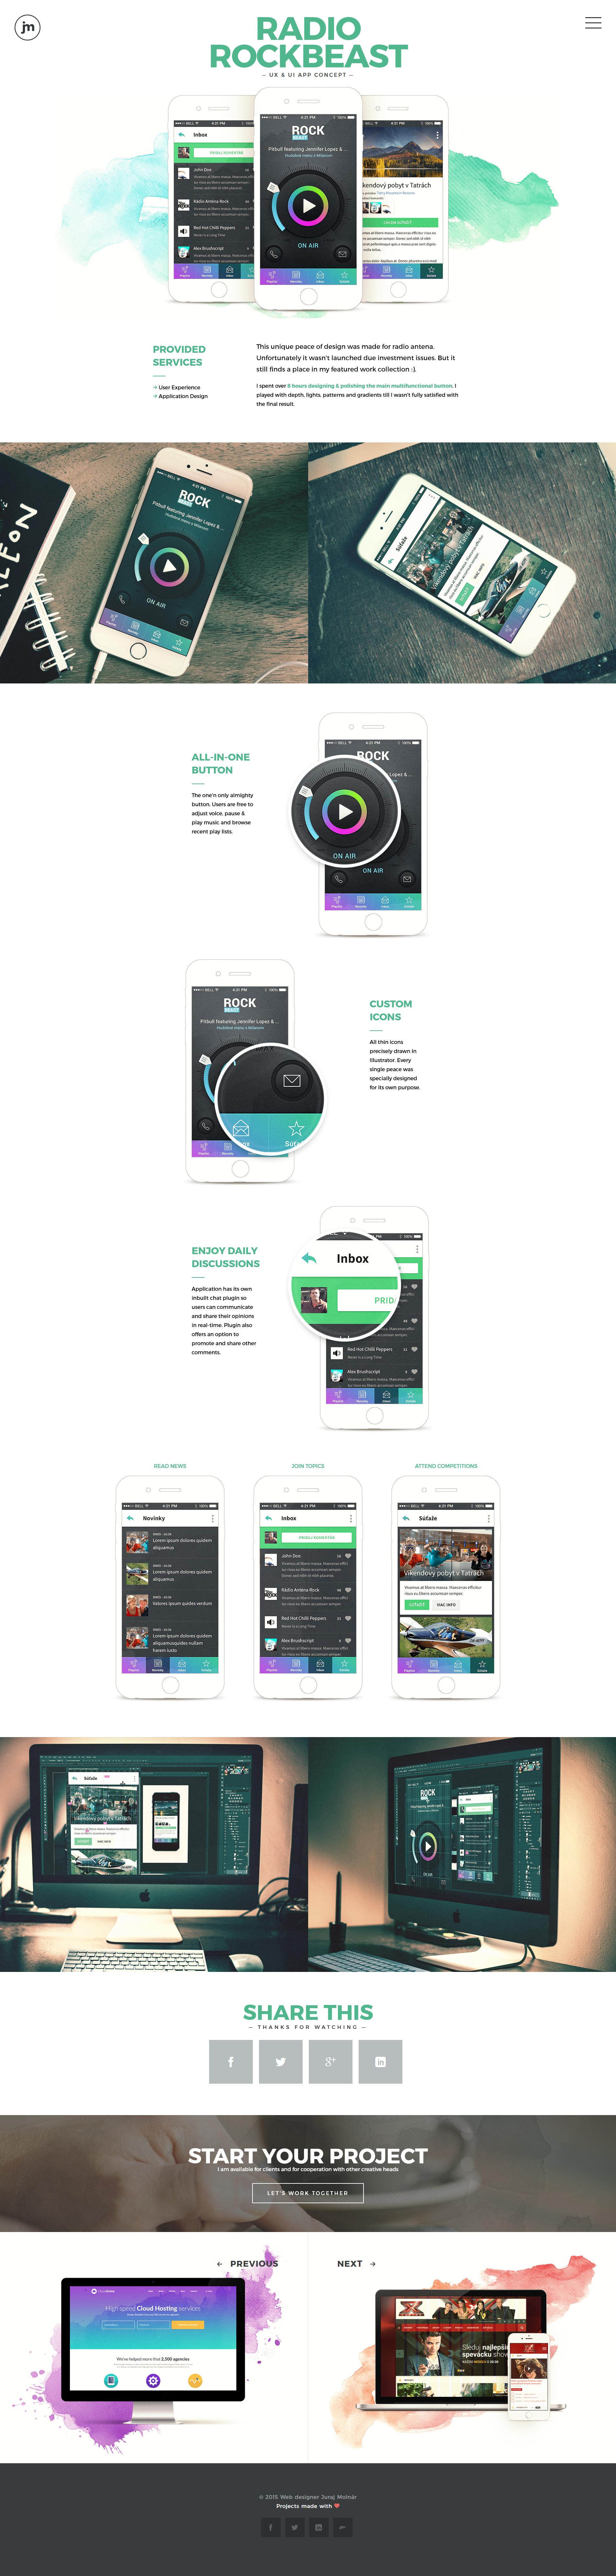 Rockbeast radio application by jurajmolnar